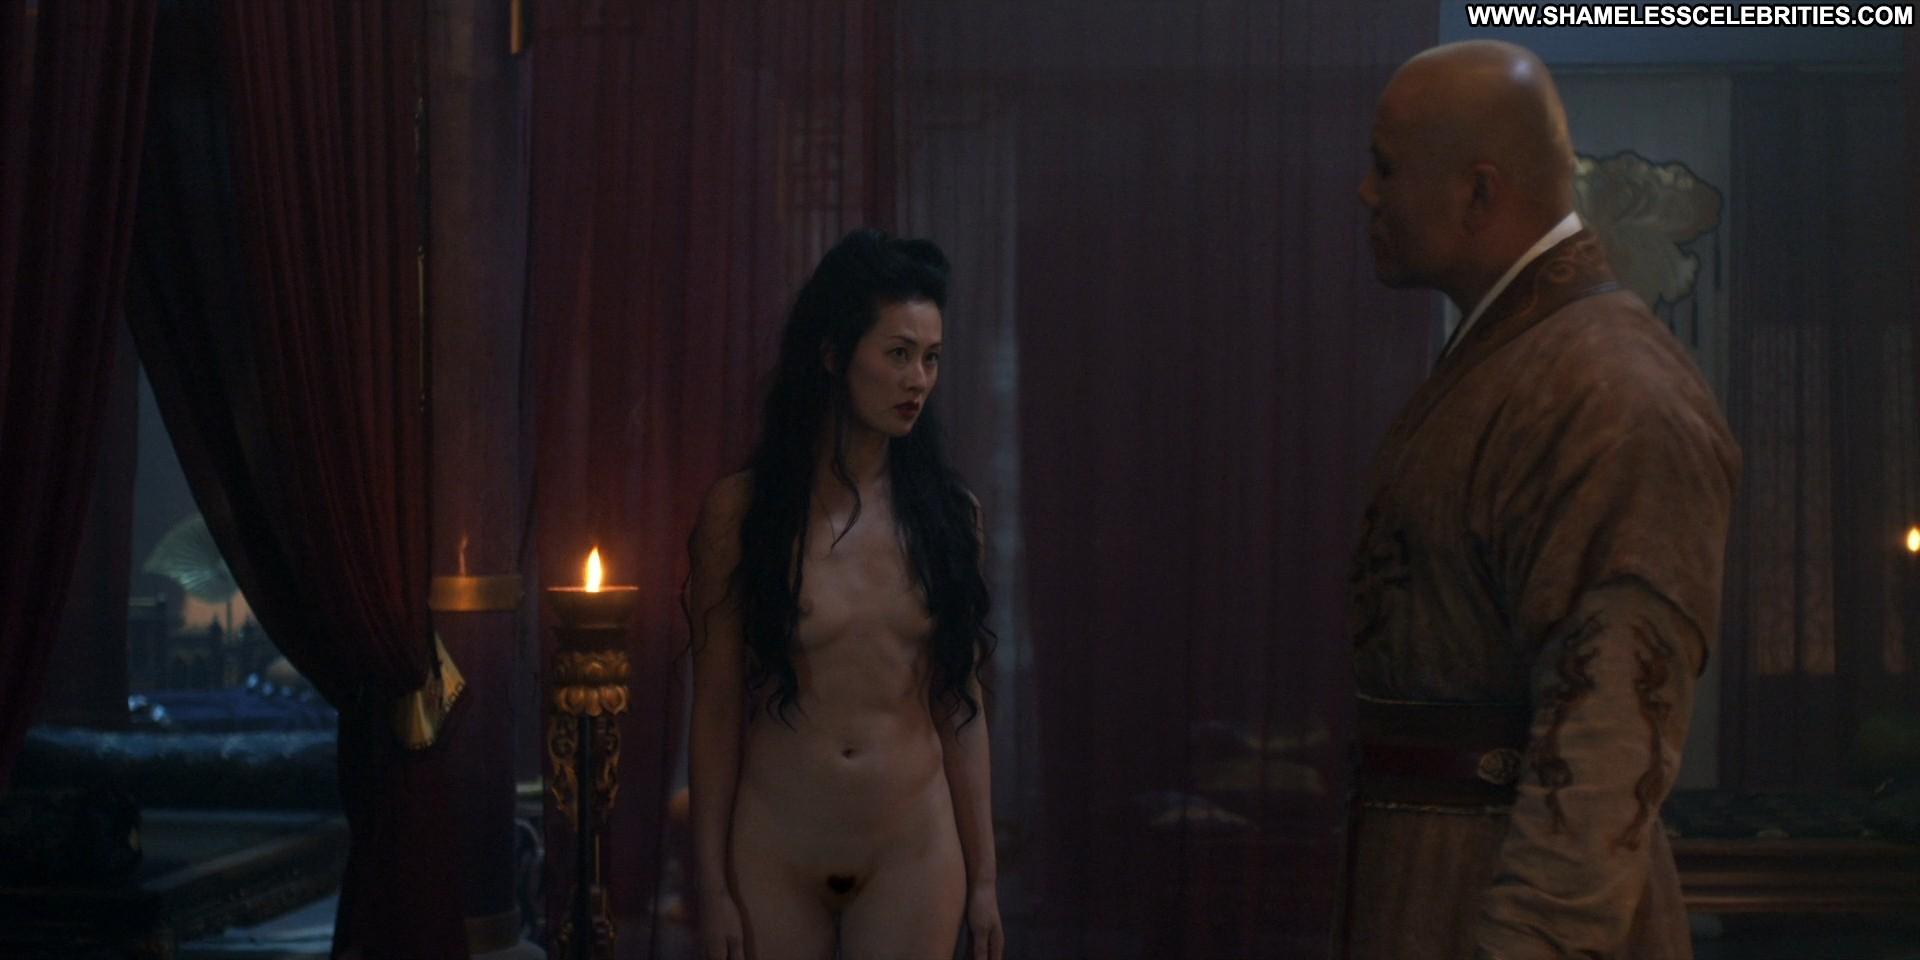 Teri polo nude scene